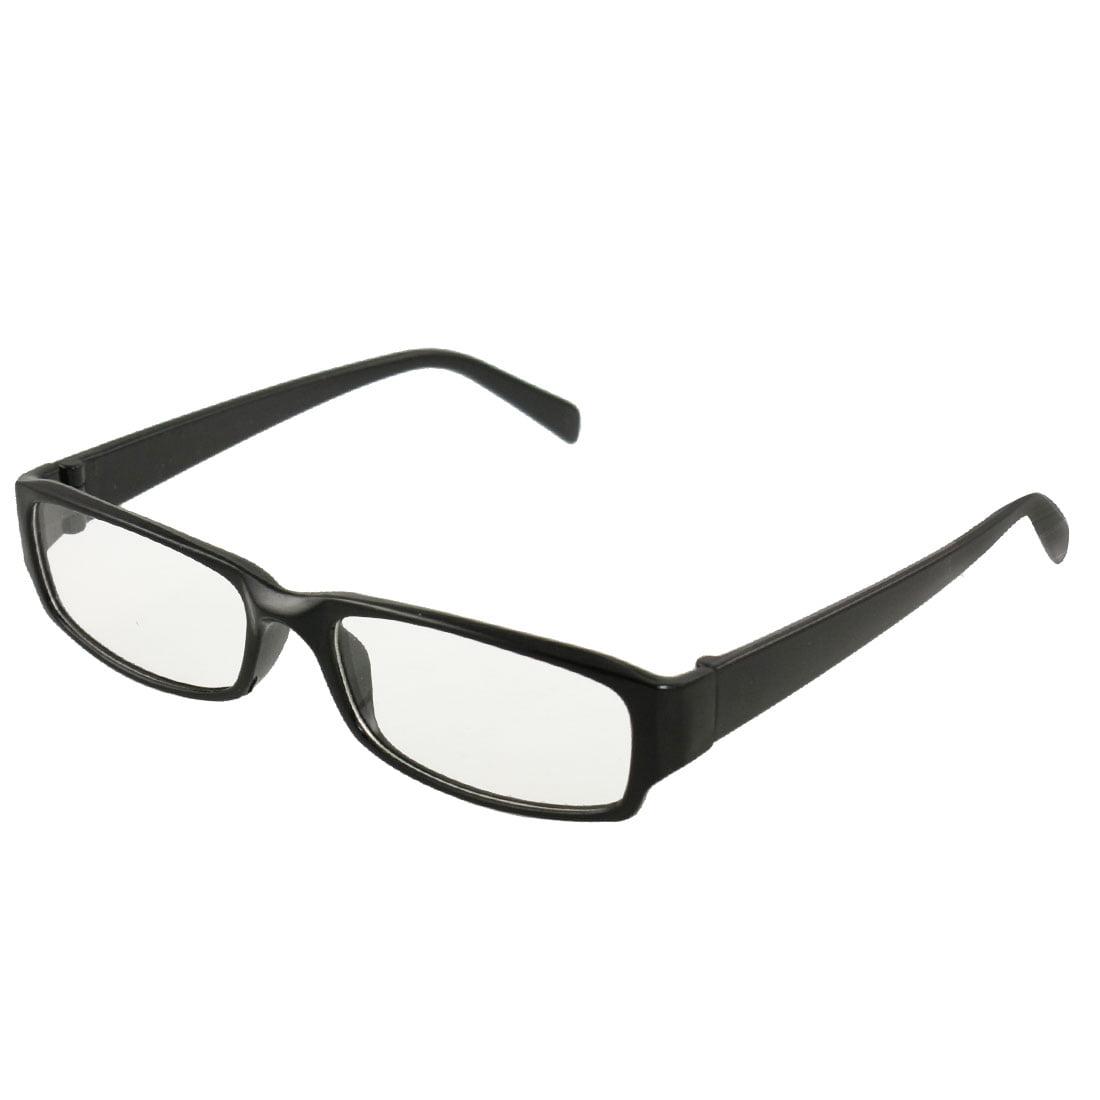 62ef5d8a00e8 Men Women Black Frame Rectangle Clear Lens Eyewear Plain Glasses -  Walmart.com